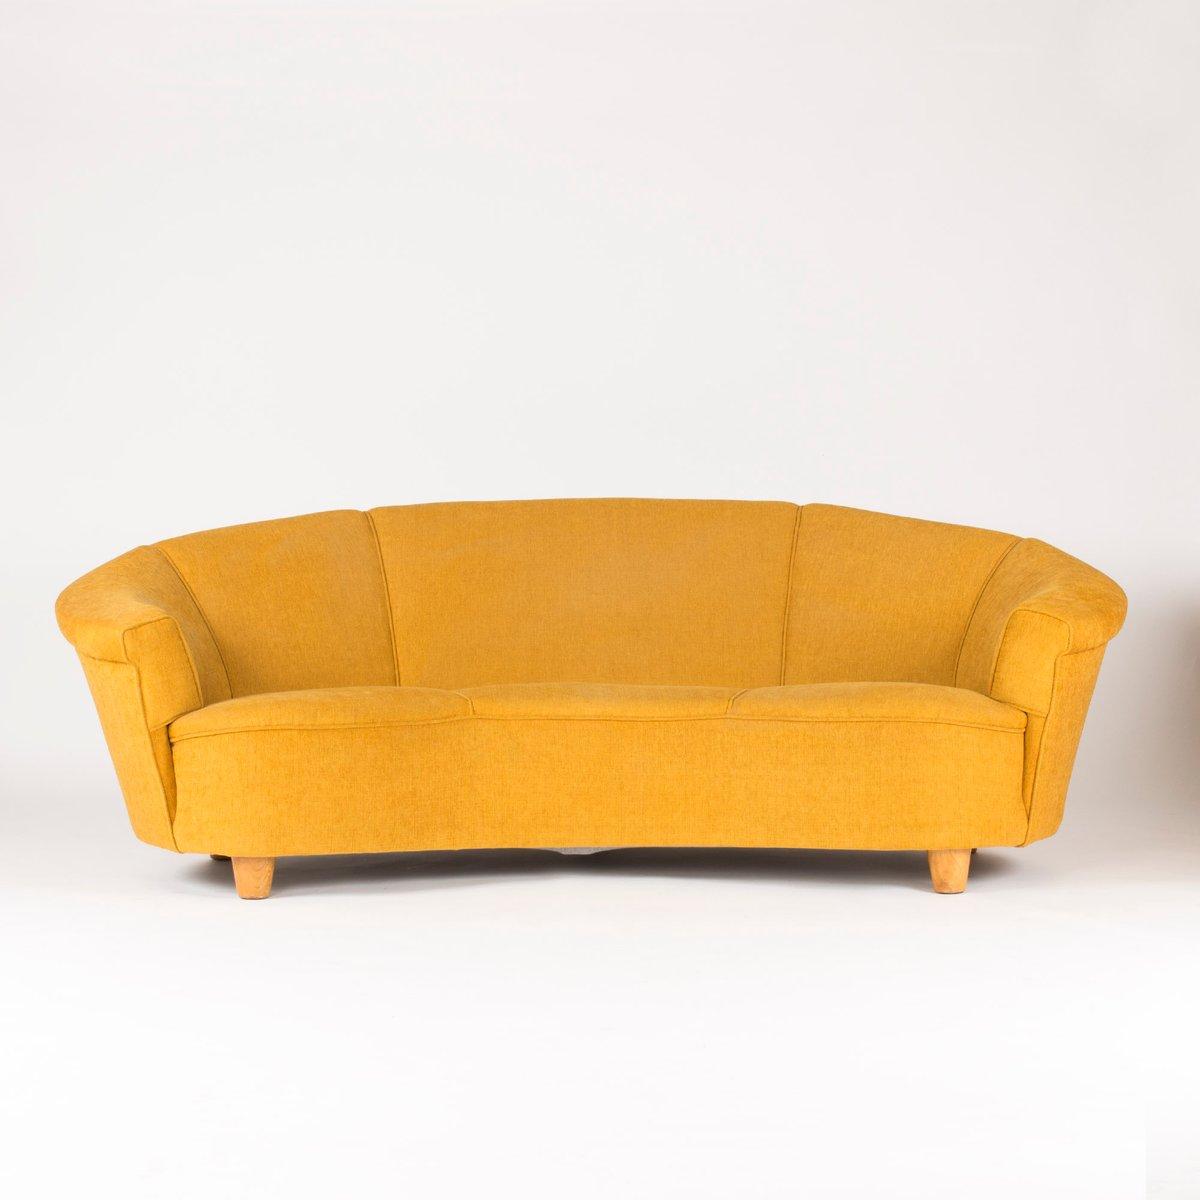 swedish sofa 1930s for sale at pamono. Black Bedroom Furniture Sets. Home Design Ideas